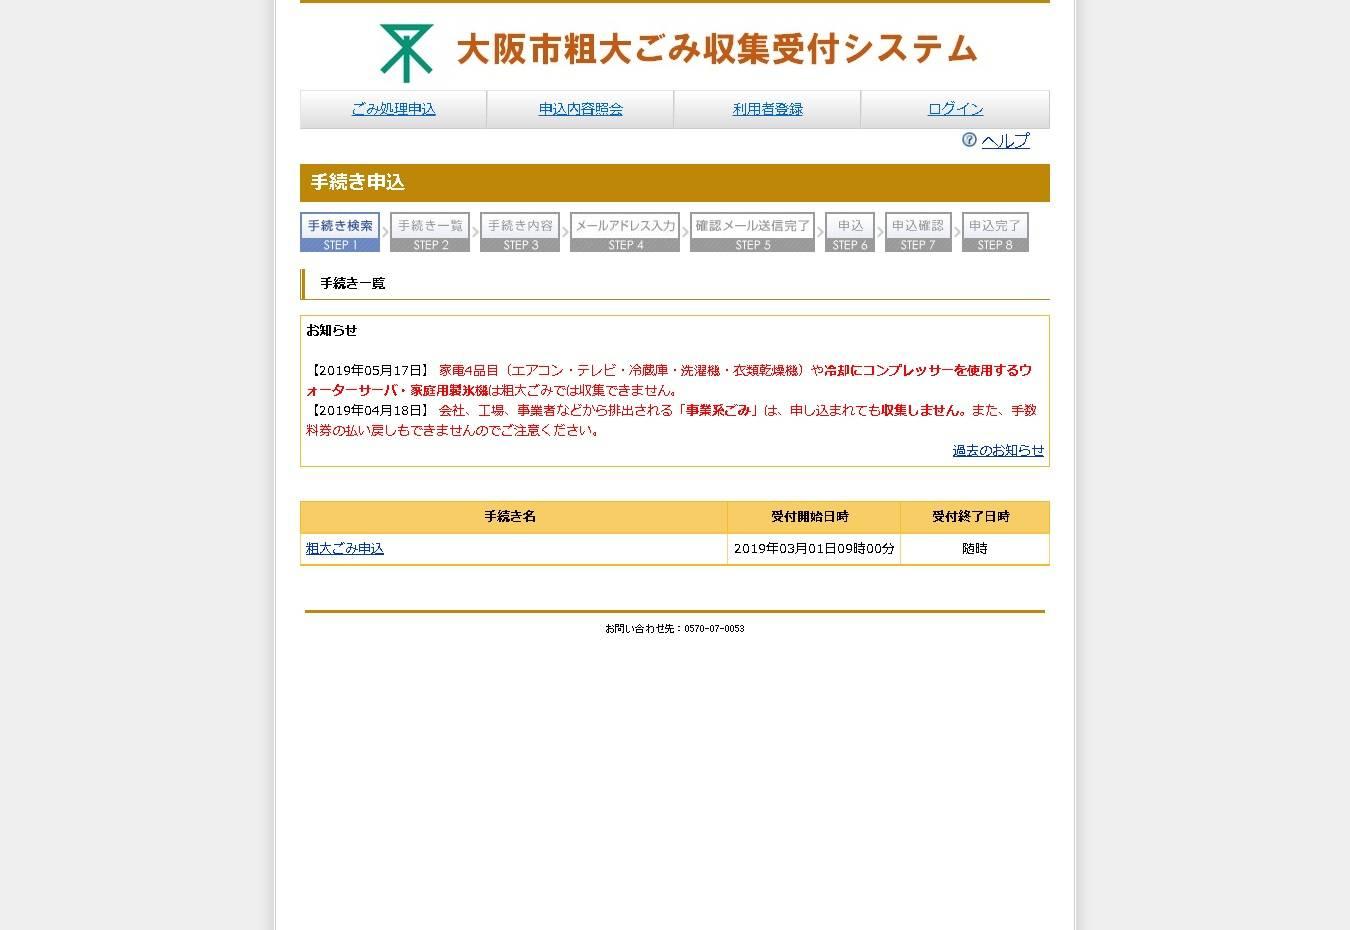 大阪 市 粗大 ごみ 収集 受付